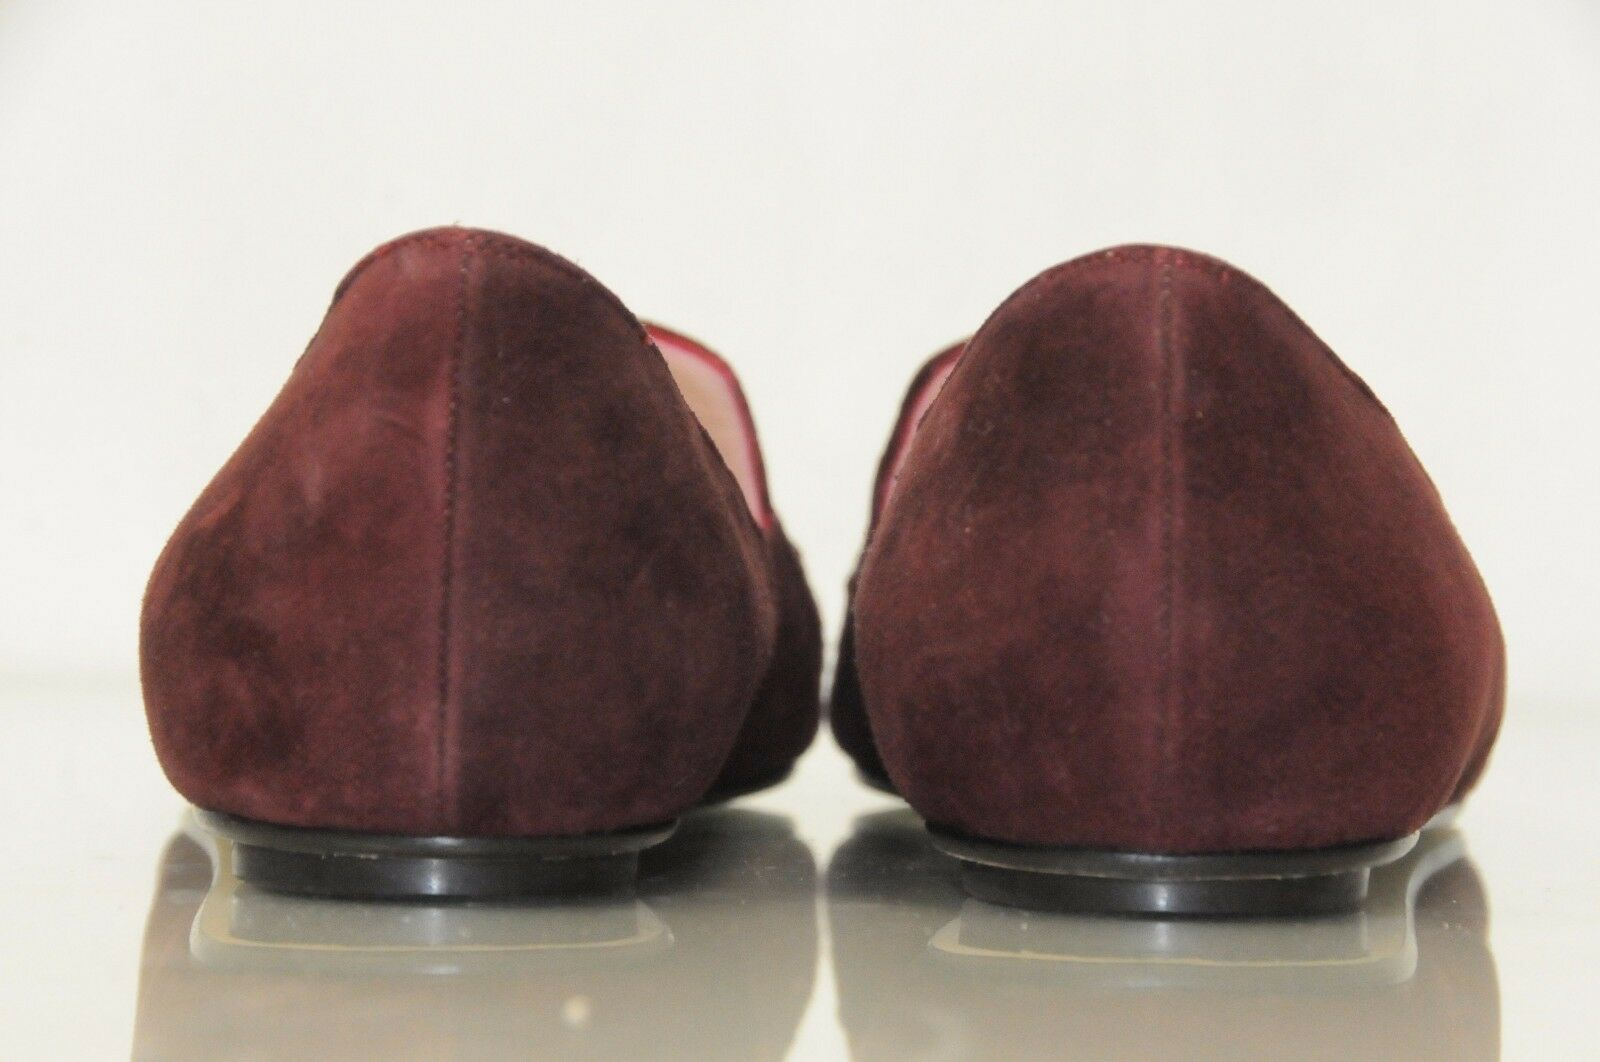 850 NEW OSCAR De La RENTA    Hilery embellished BURGUNDY suede flats shoes 41 e432aa